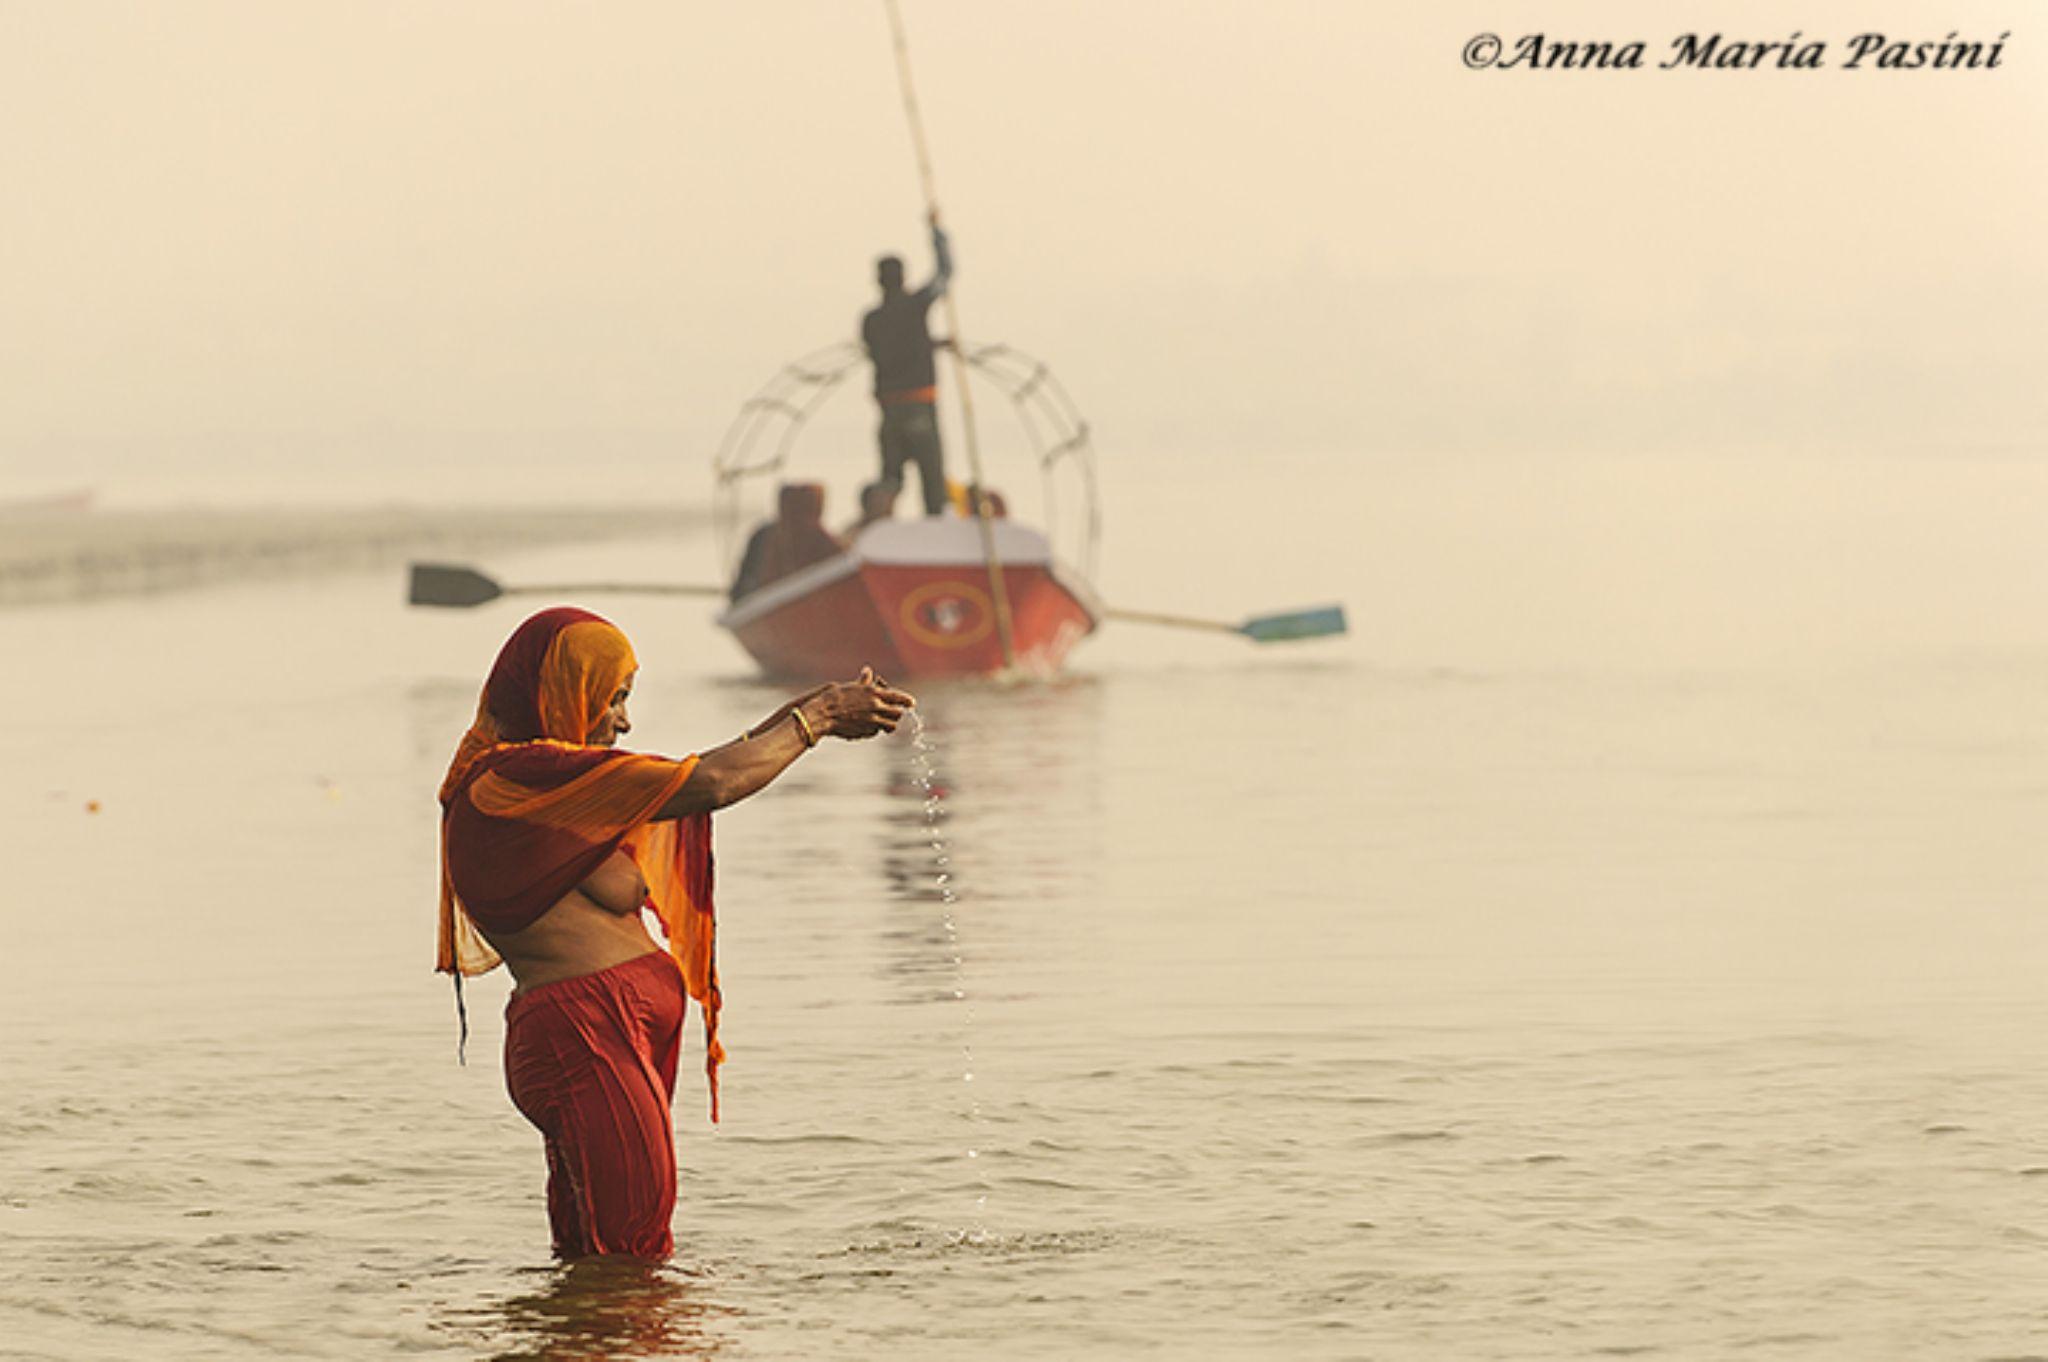 Preghiera sul Gange by annamariapasini